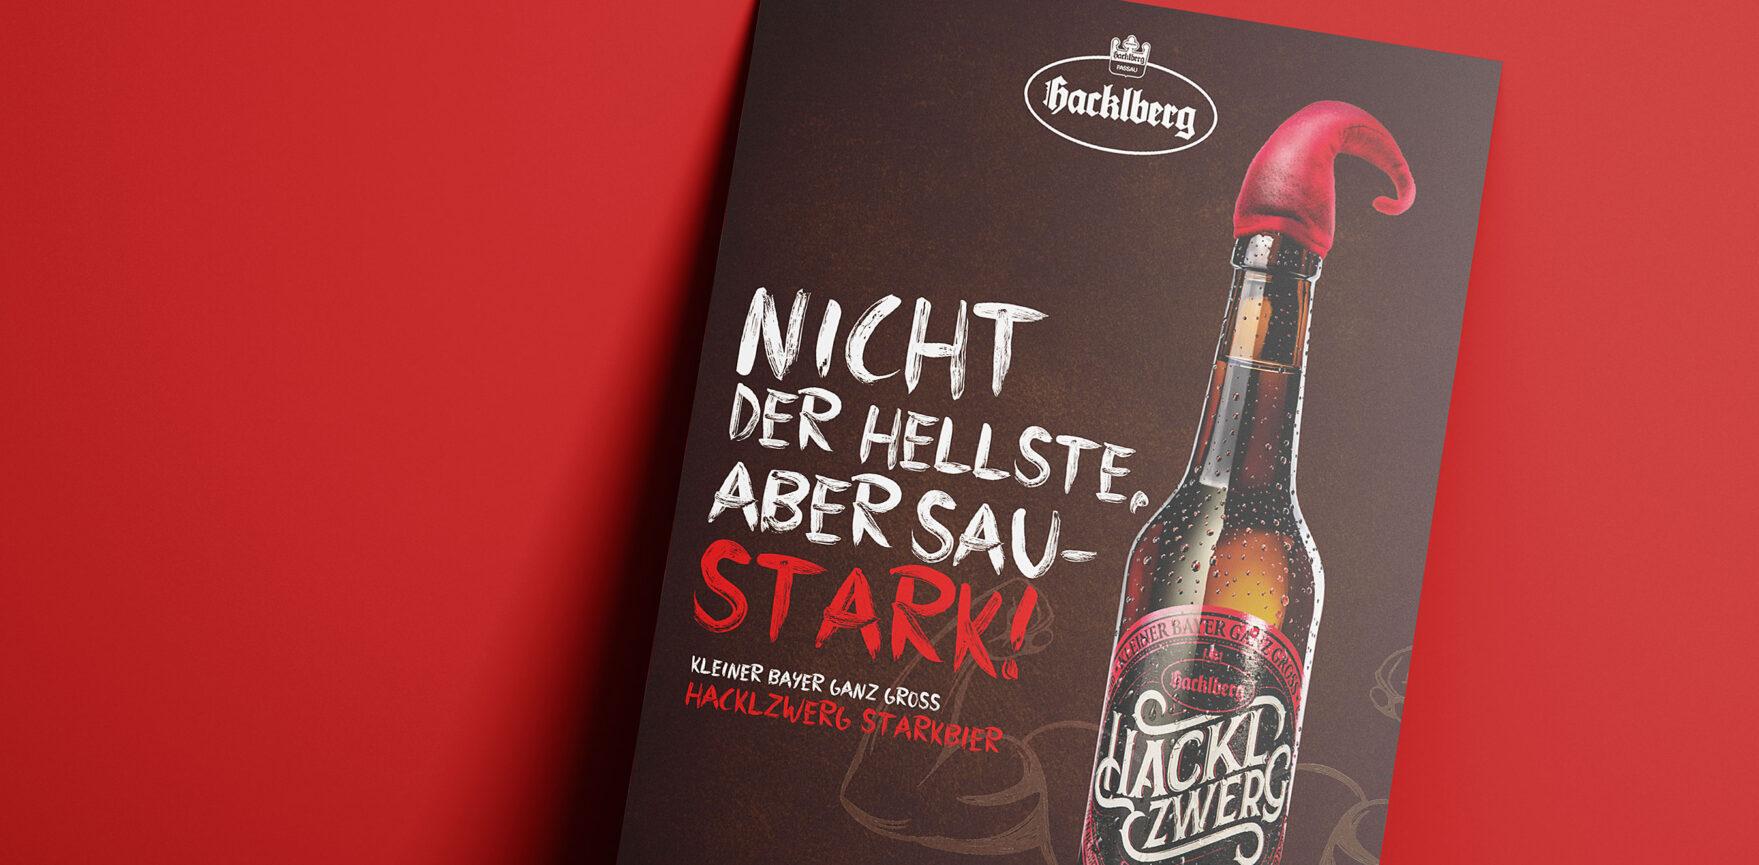 Brauerei Hacklberg - Hacklzwerg Kampagne Flyer